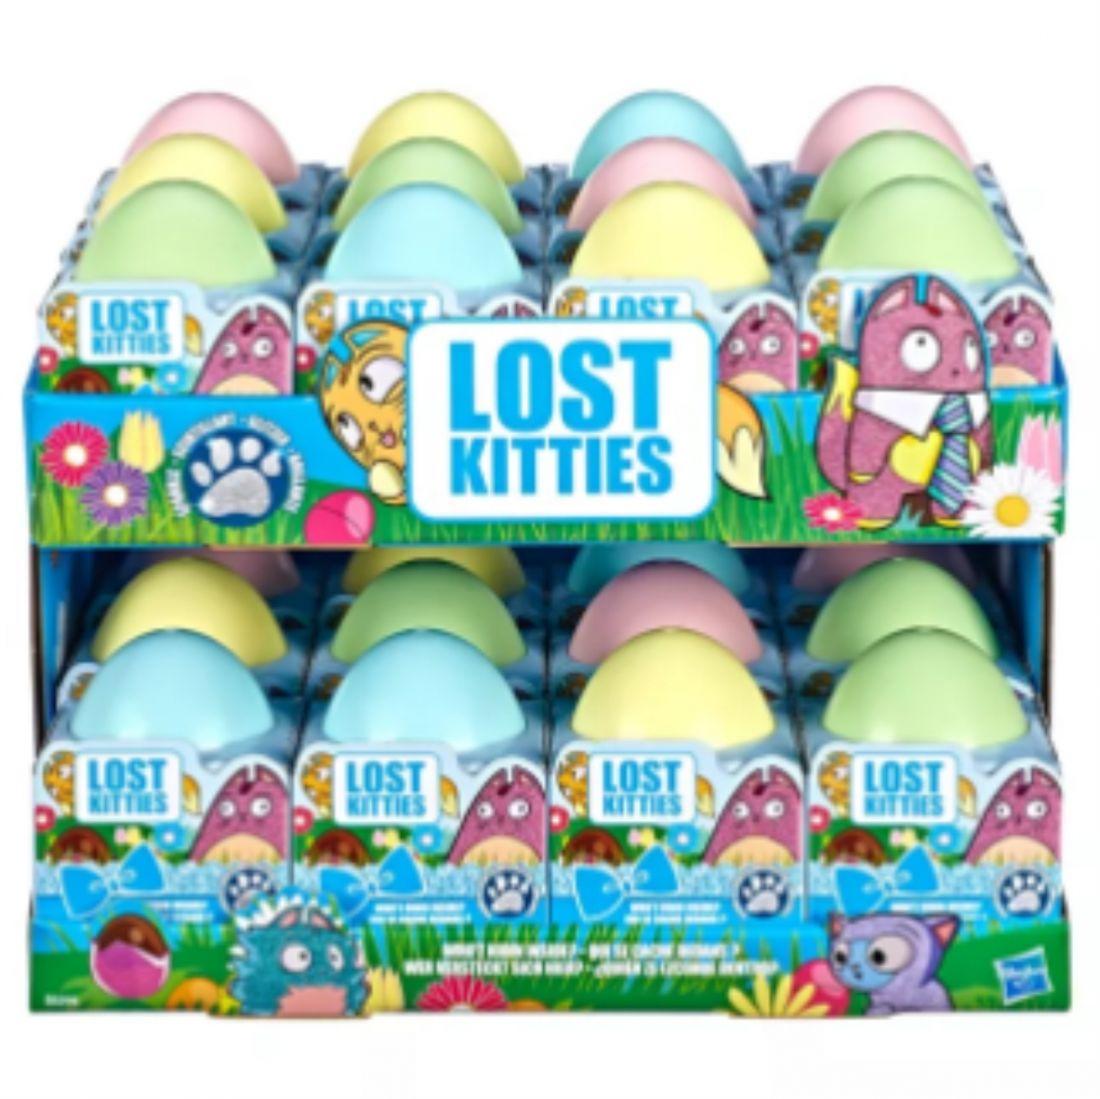 Lost kitties яйцо-сюрприз в ассортименте